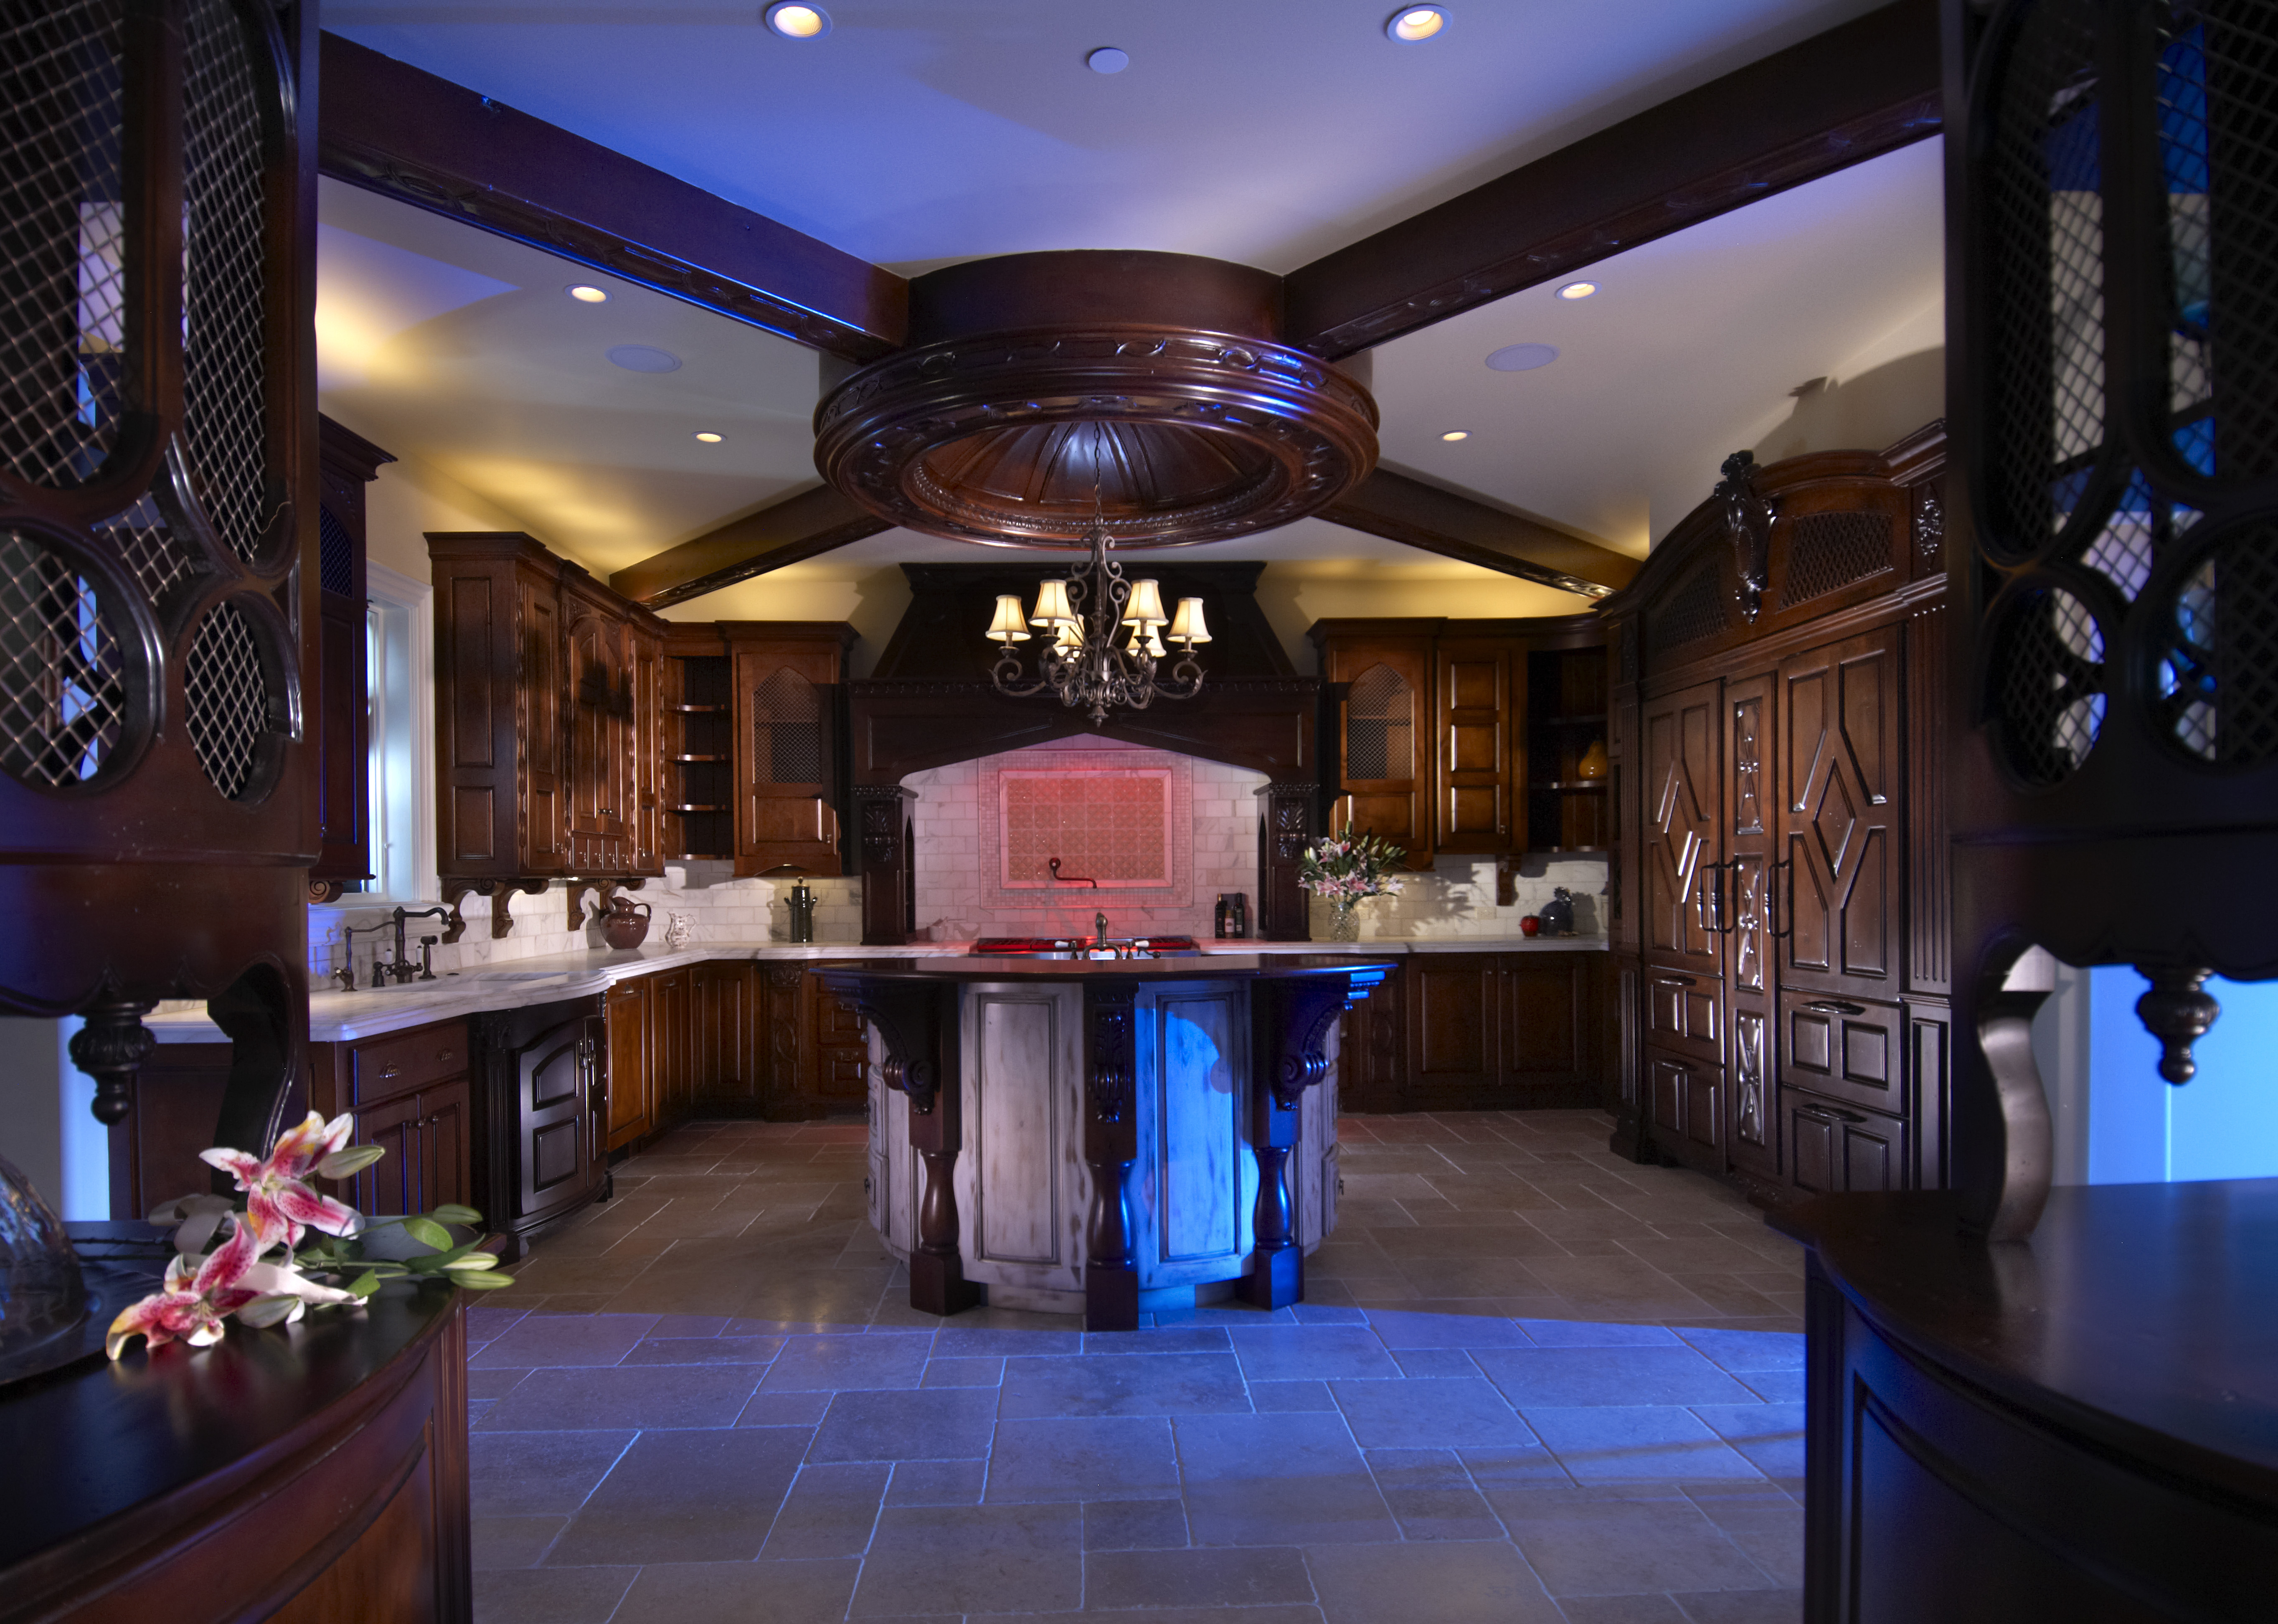 Lodding Kitchen Blue